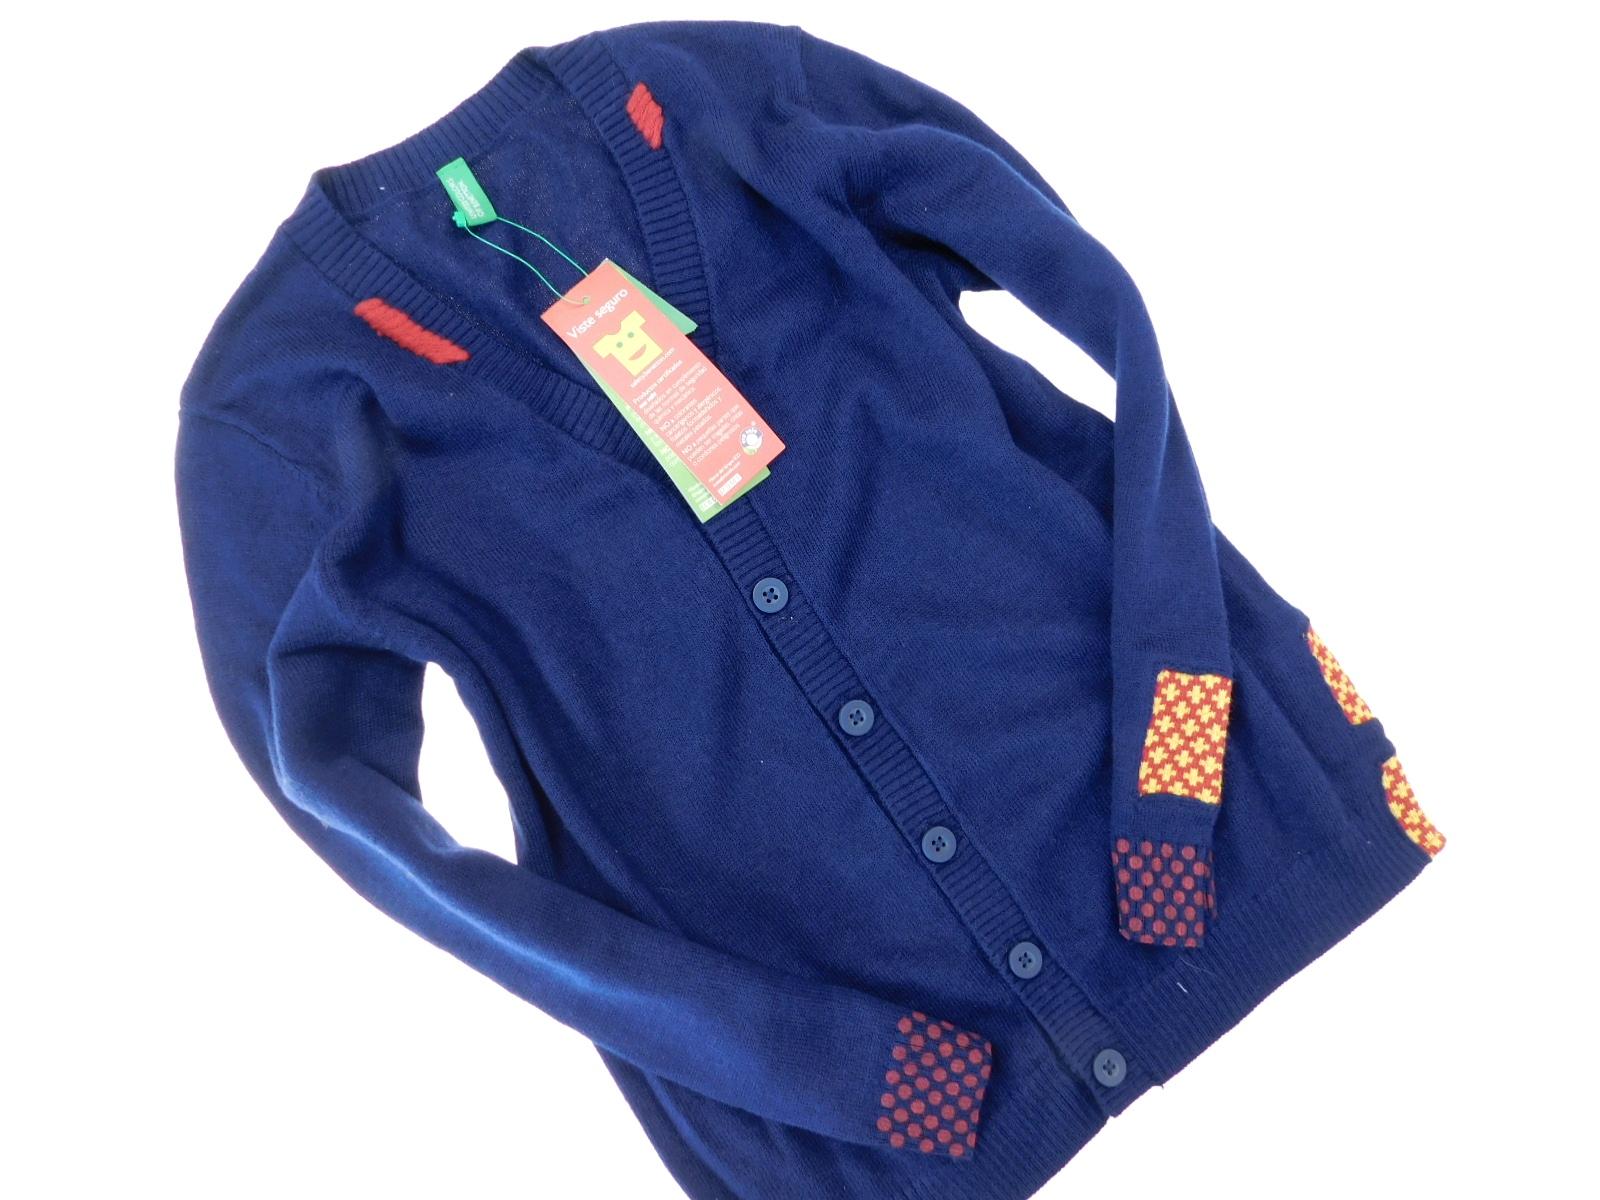 benetton nowy sweterek zapinany _ 110